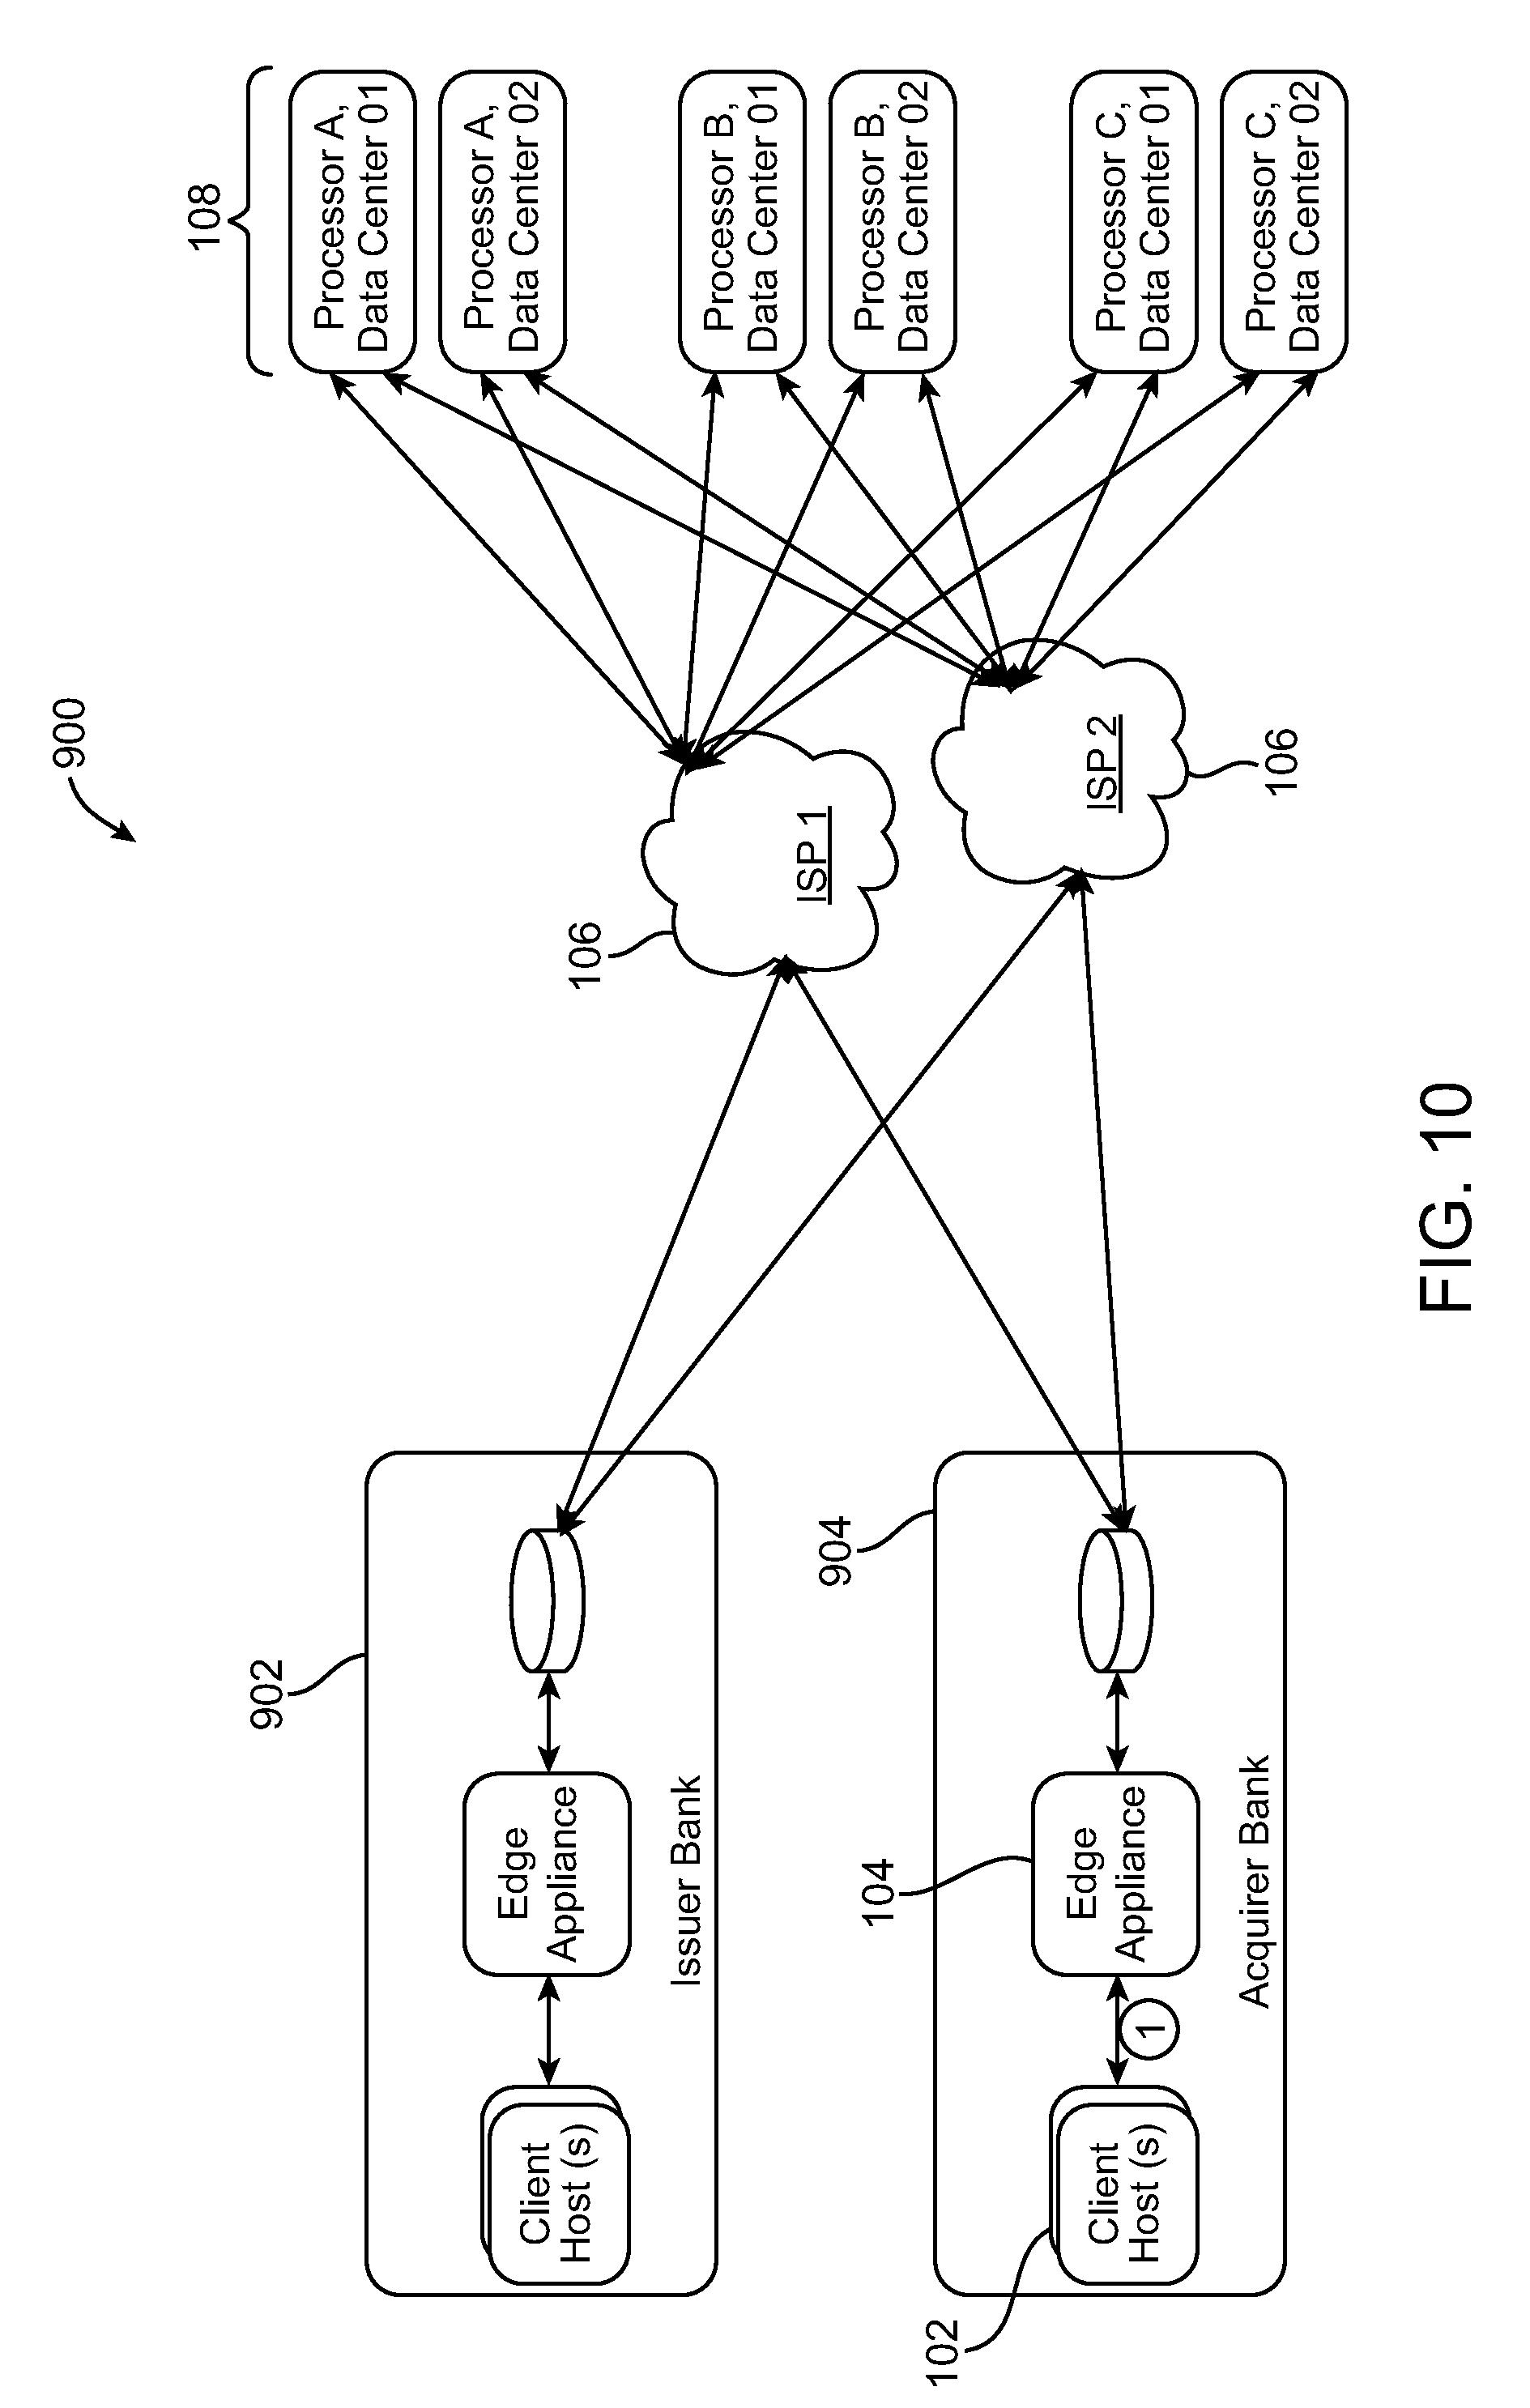 Patent US 9,756,001 B2